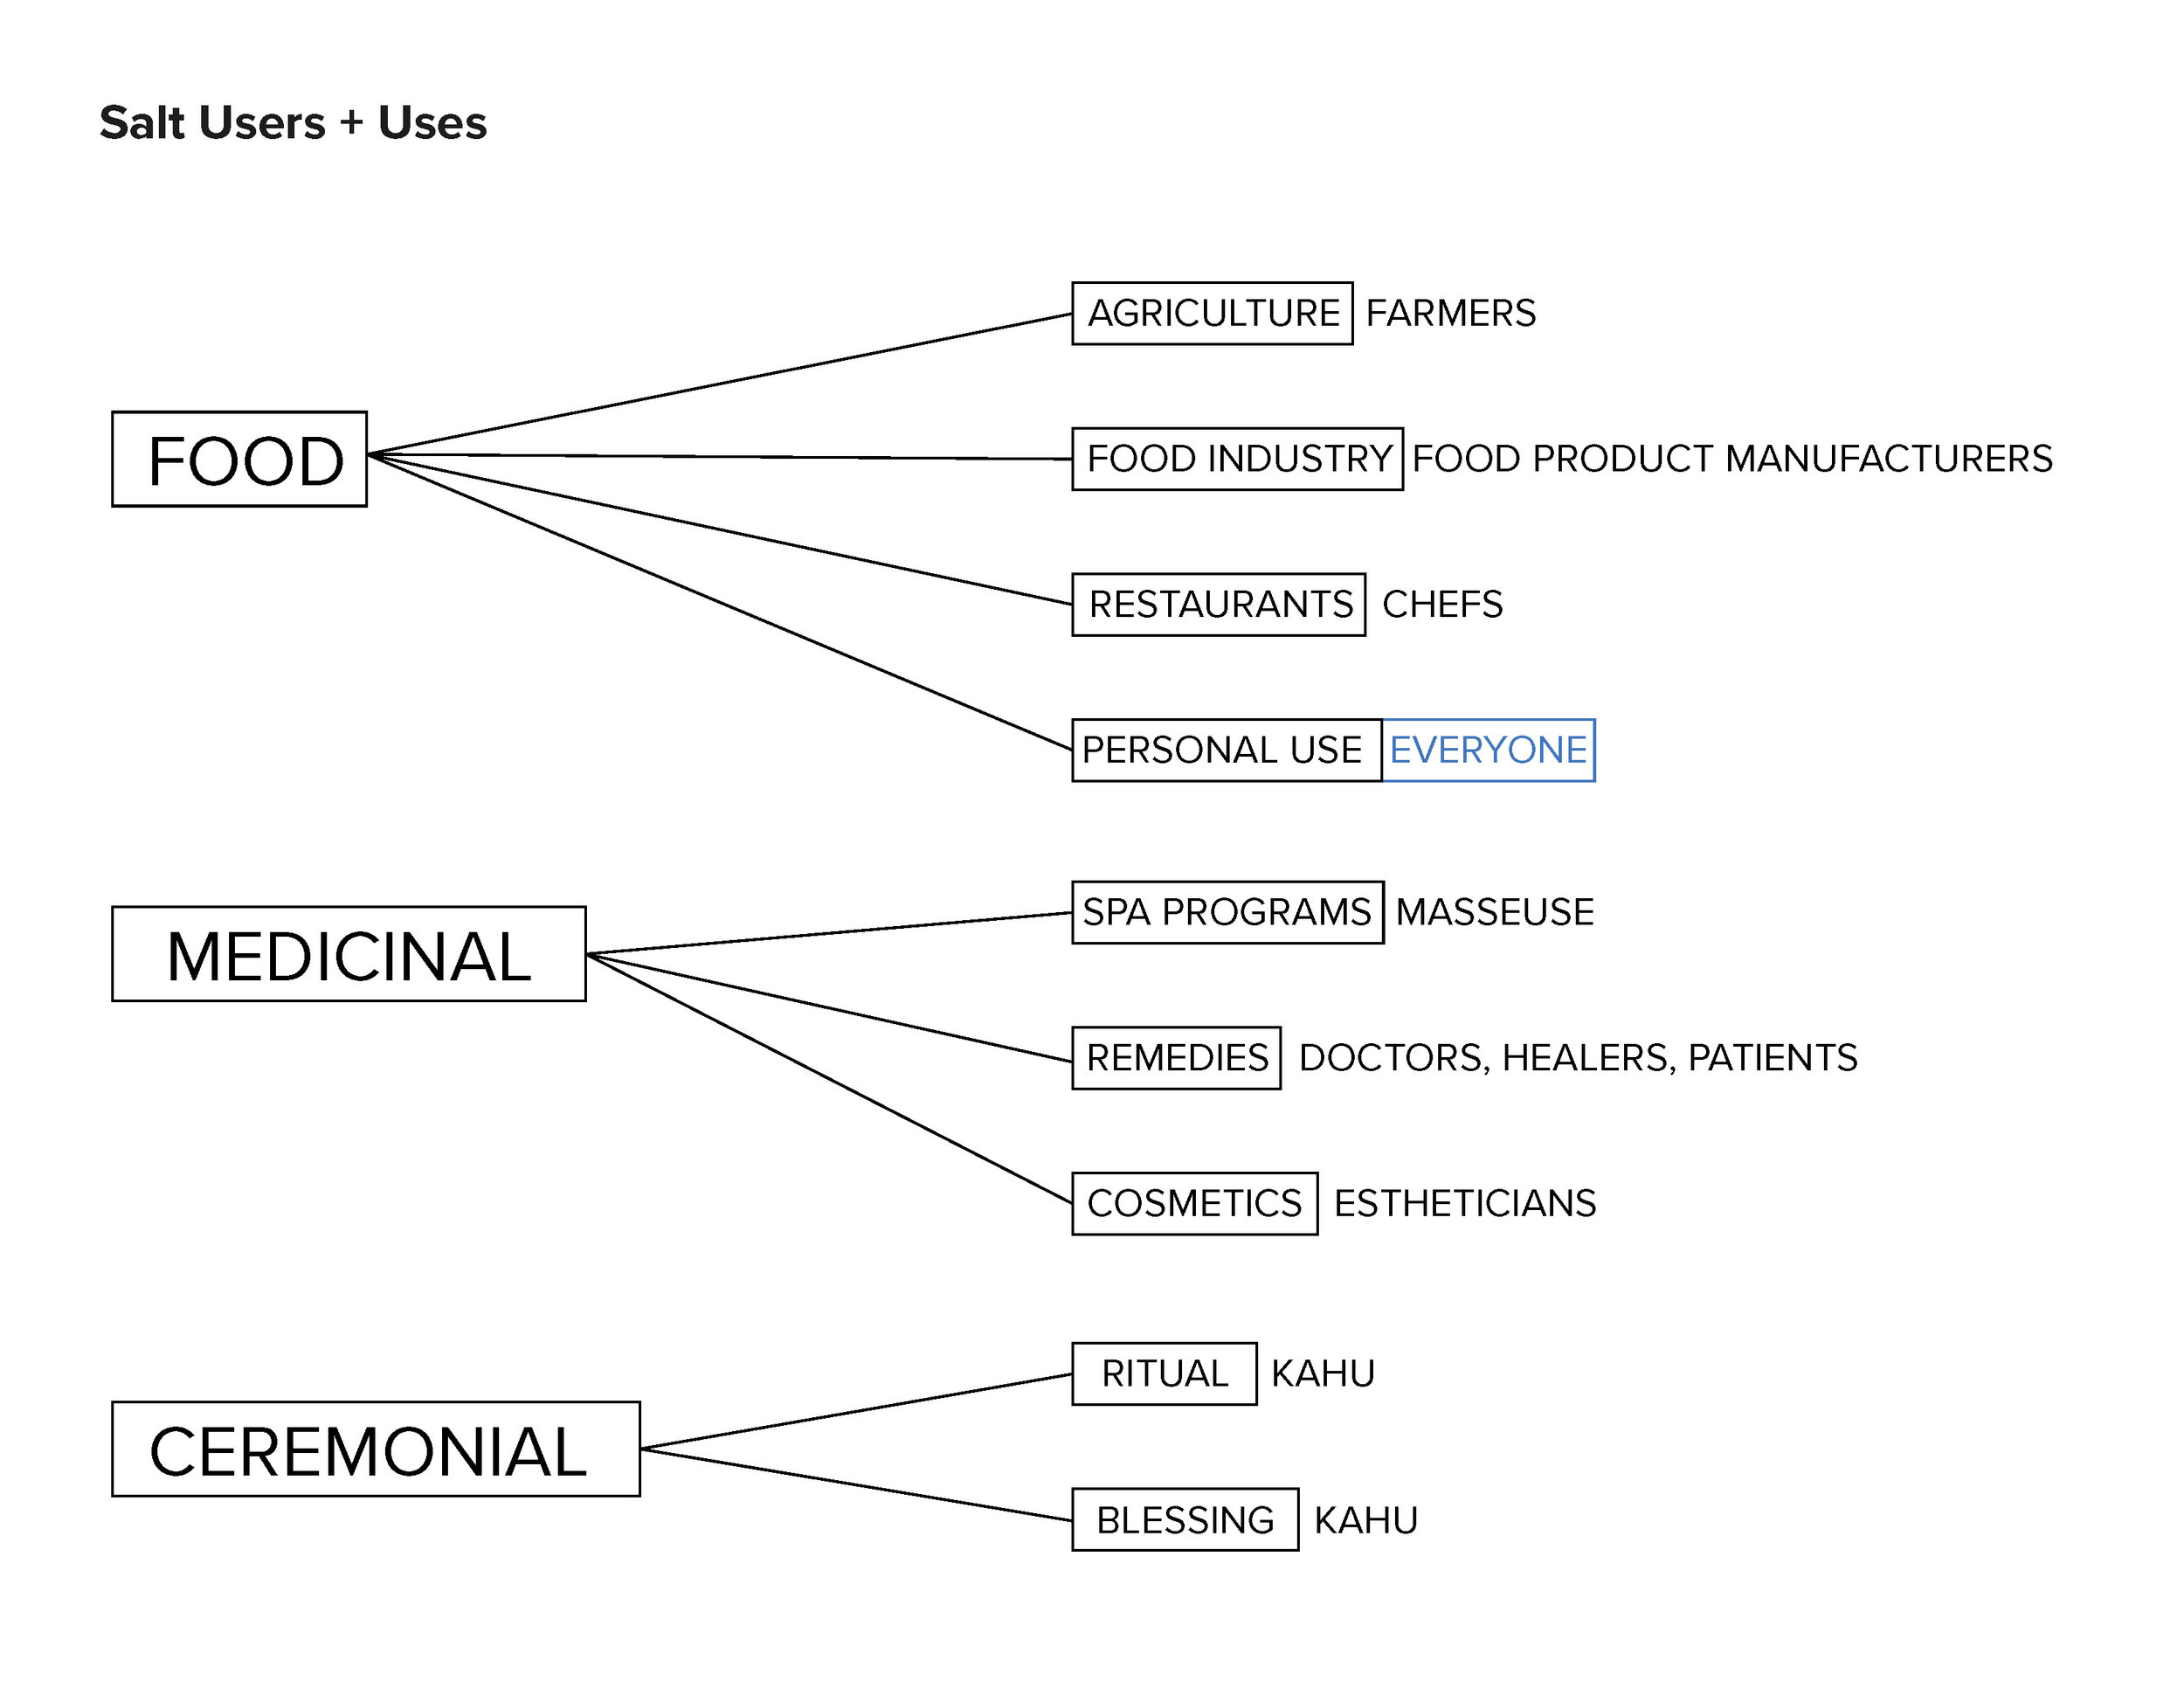 AAnt18_Salt Group_pdfpresentation_final_Page_17.jpg